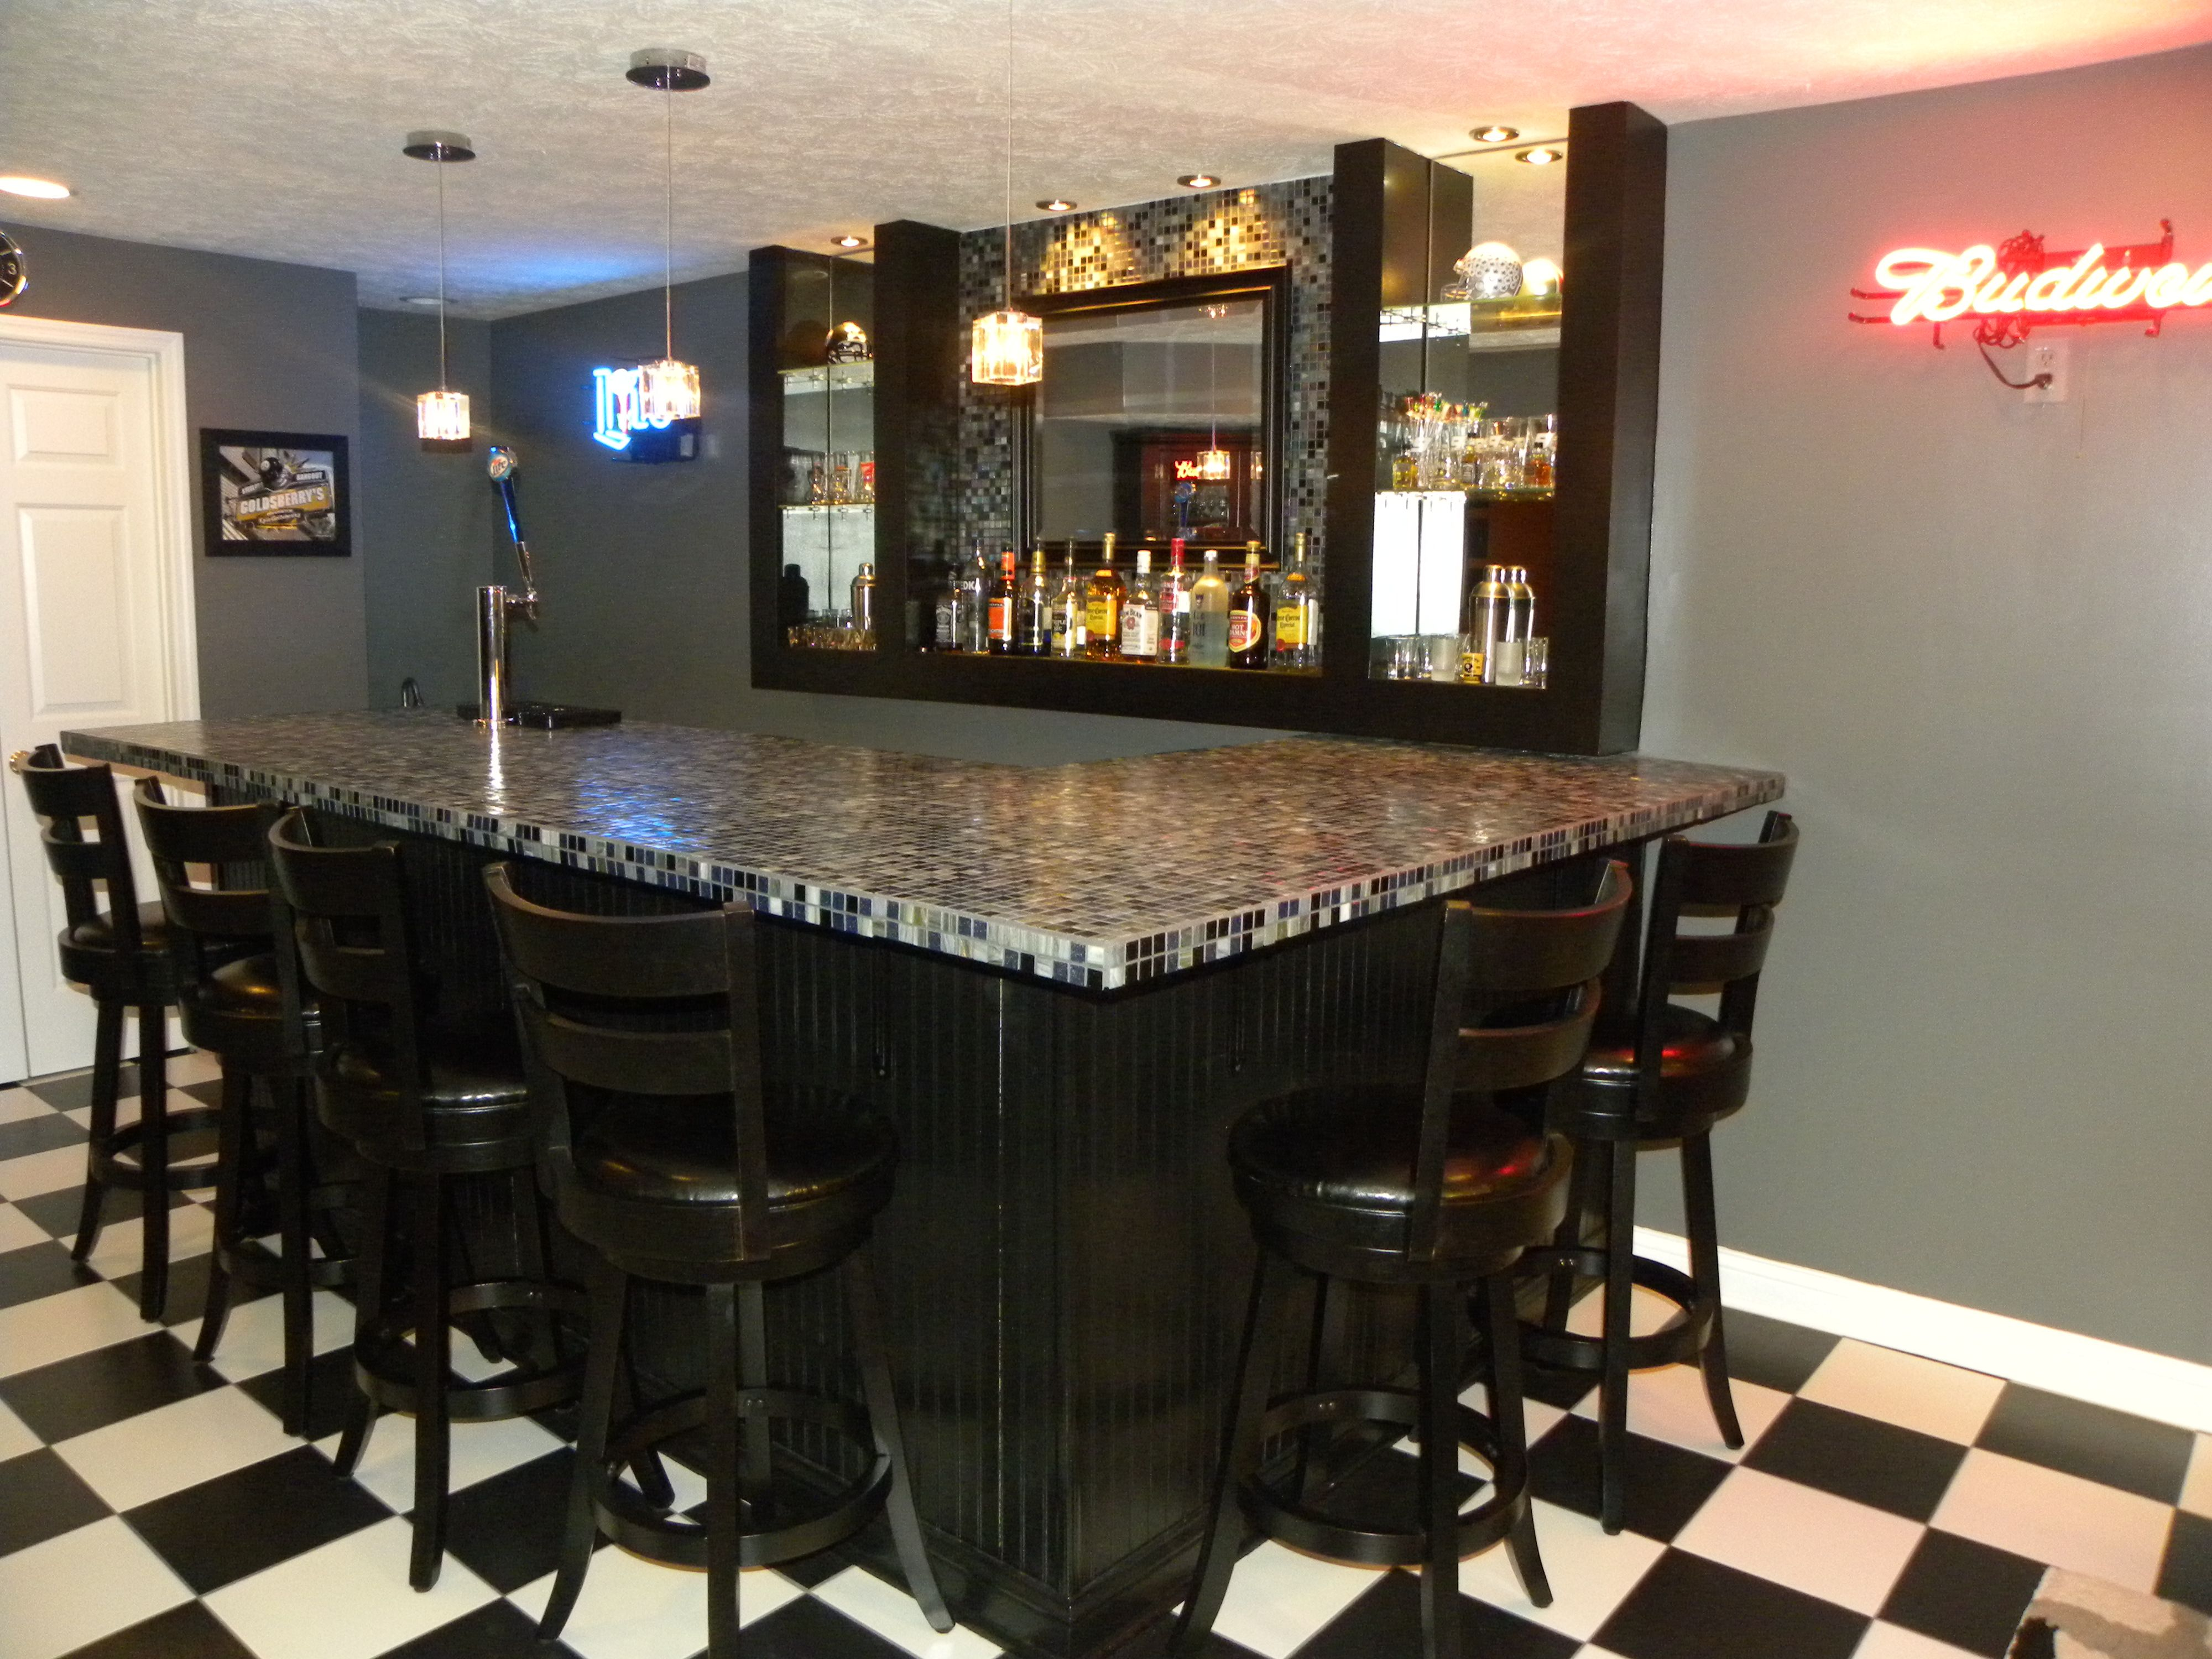 Basement bar diy pinterest - Basemant with bar ...